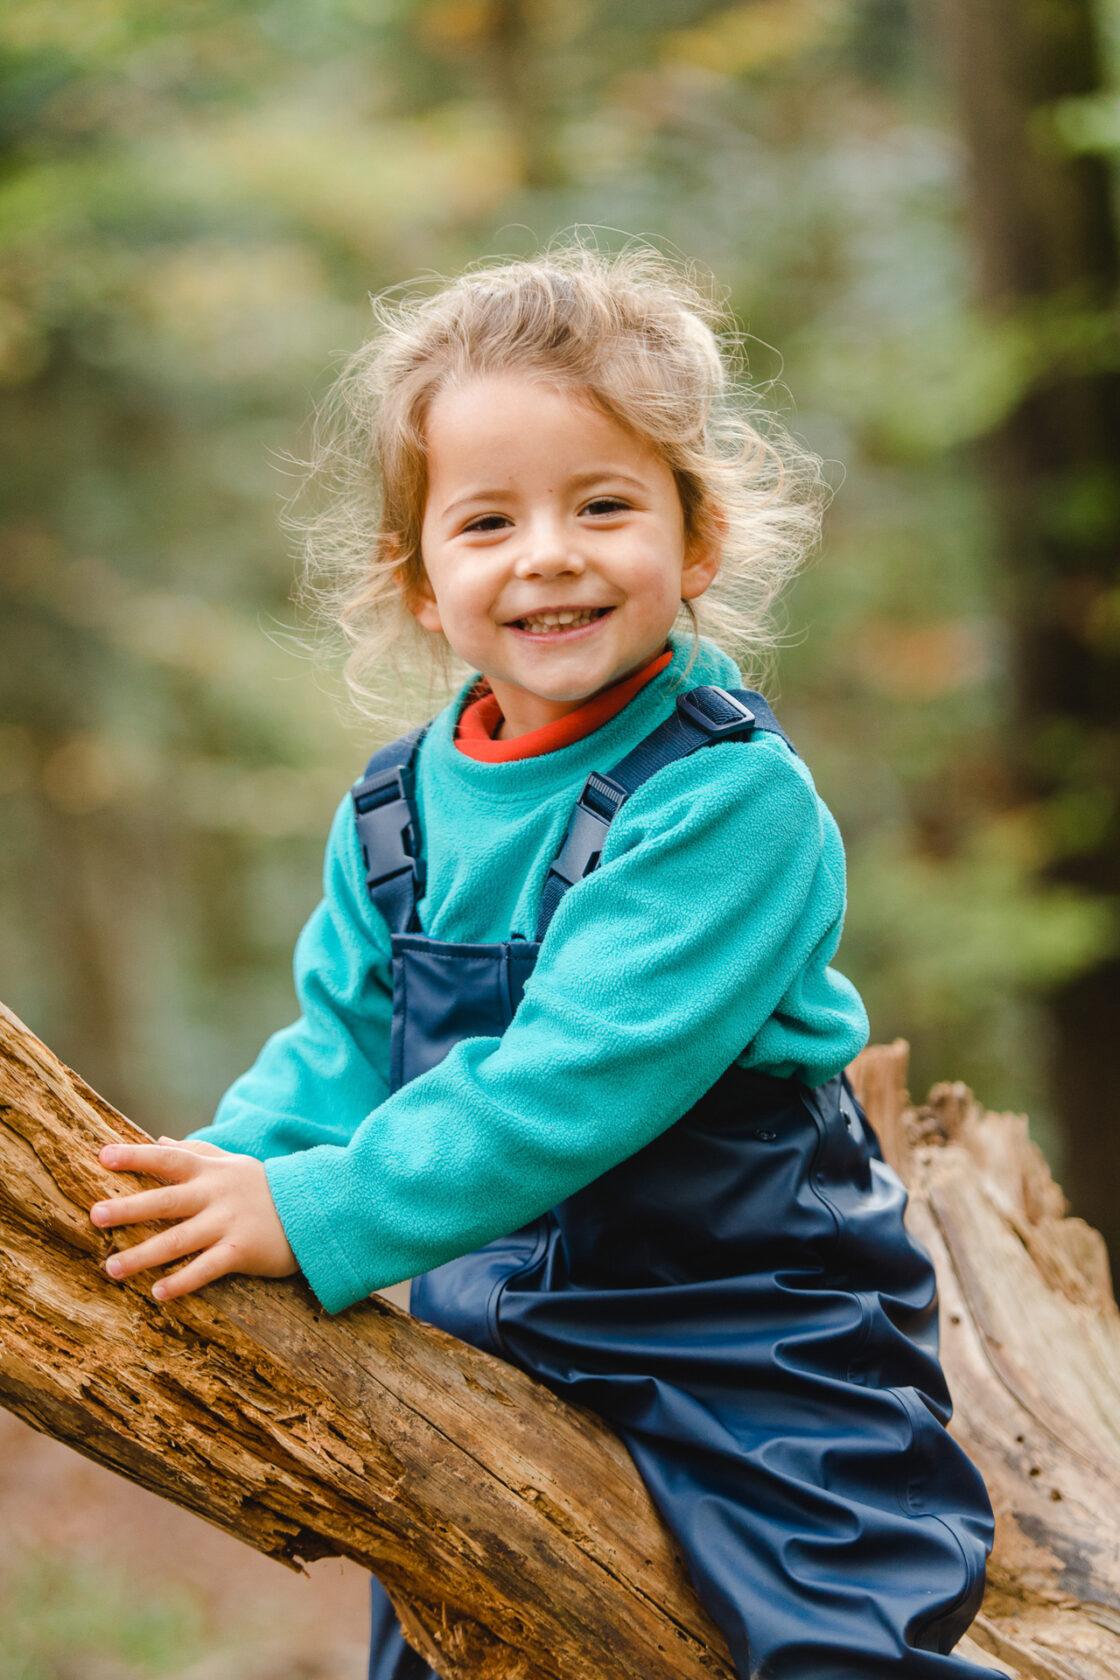 Kindergartenfotografie - Waldgruppe